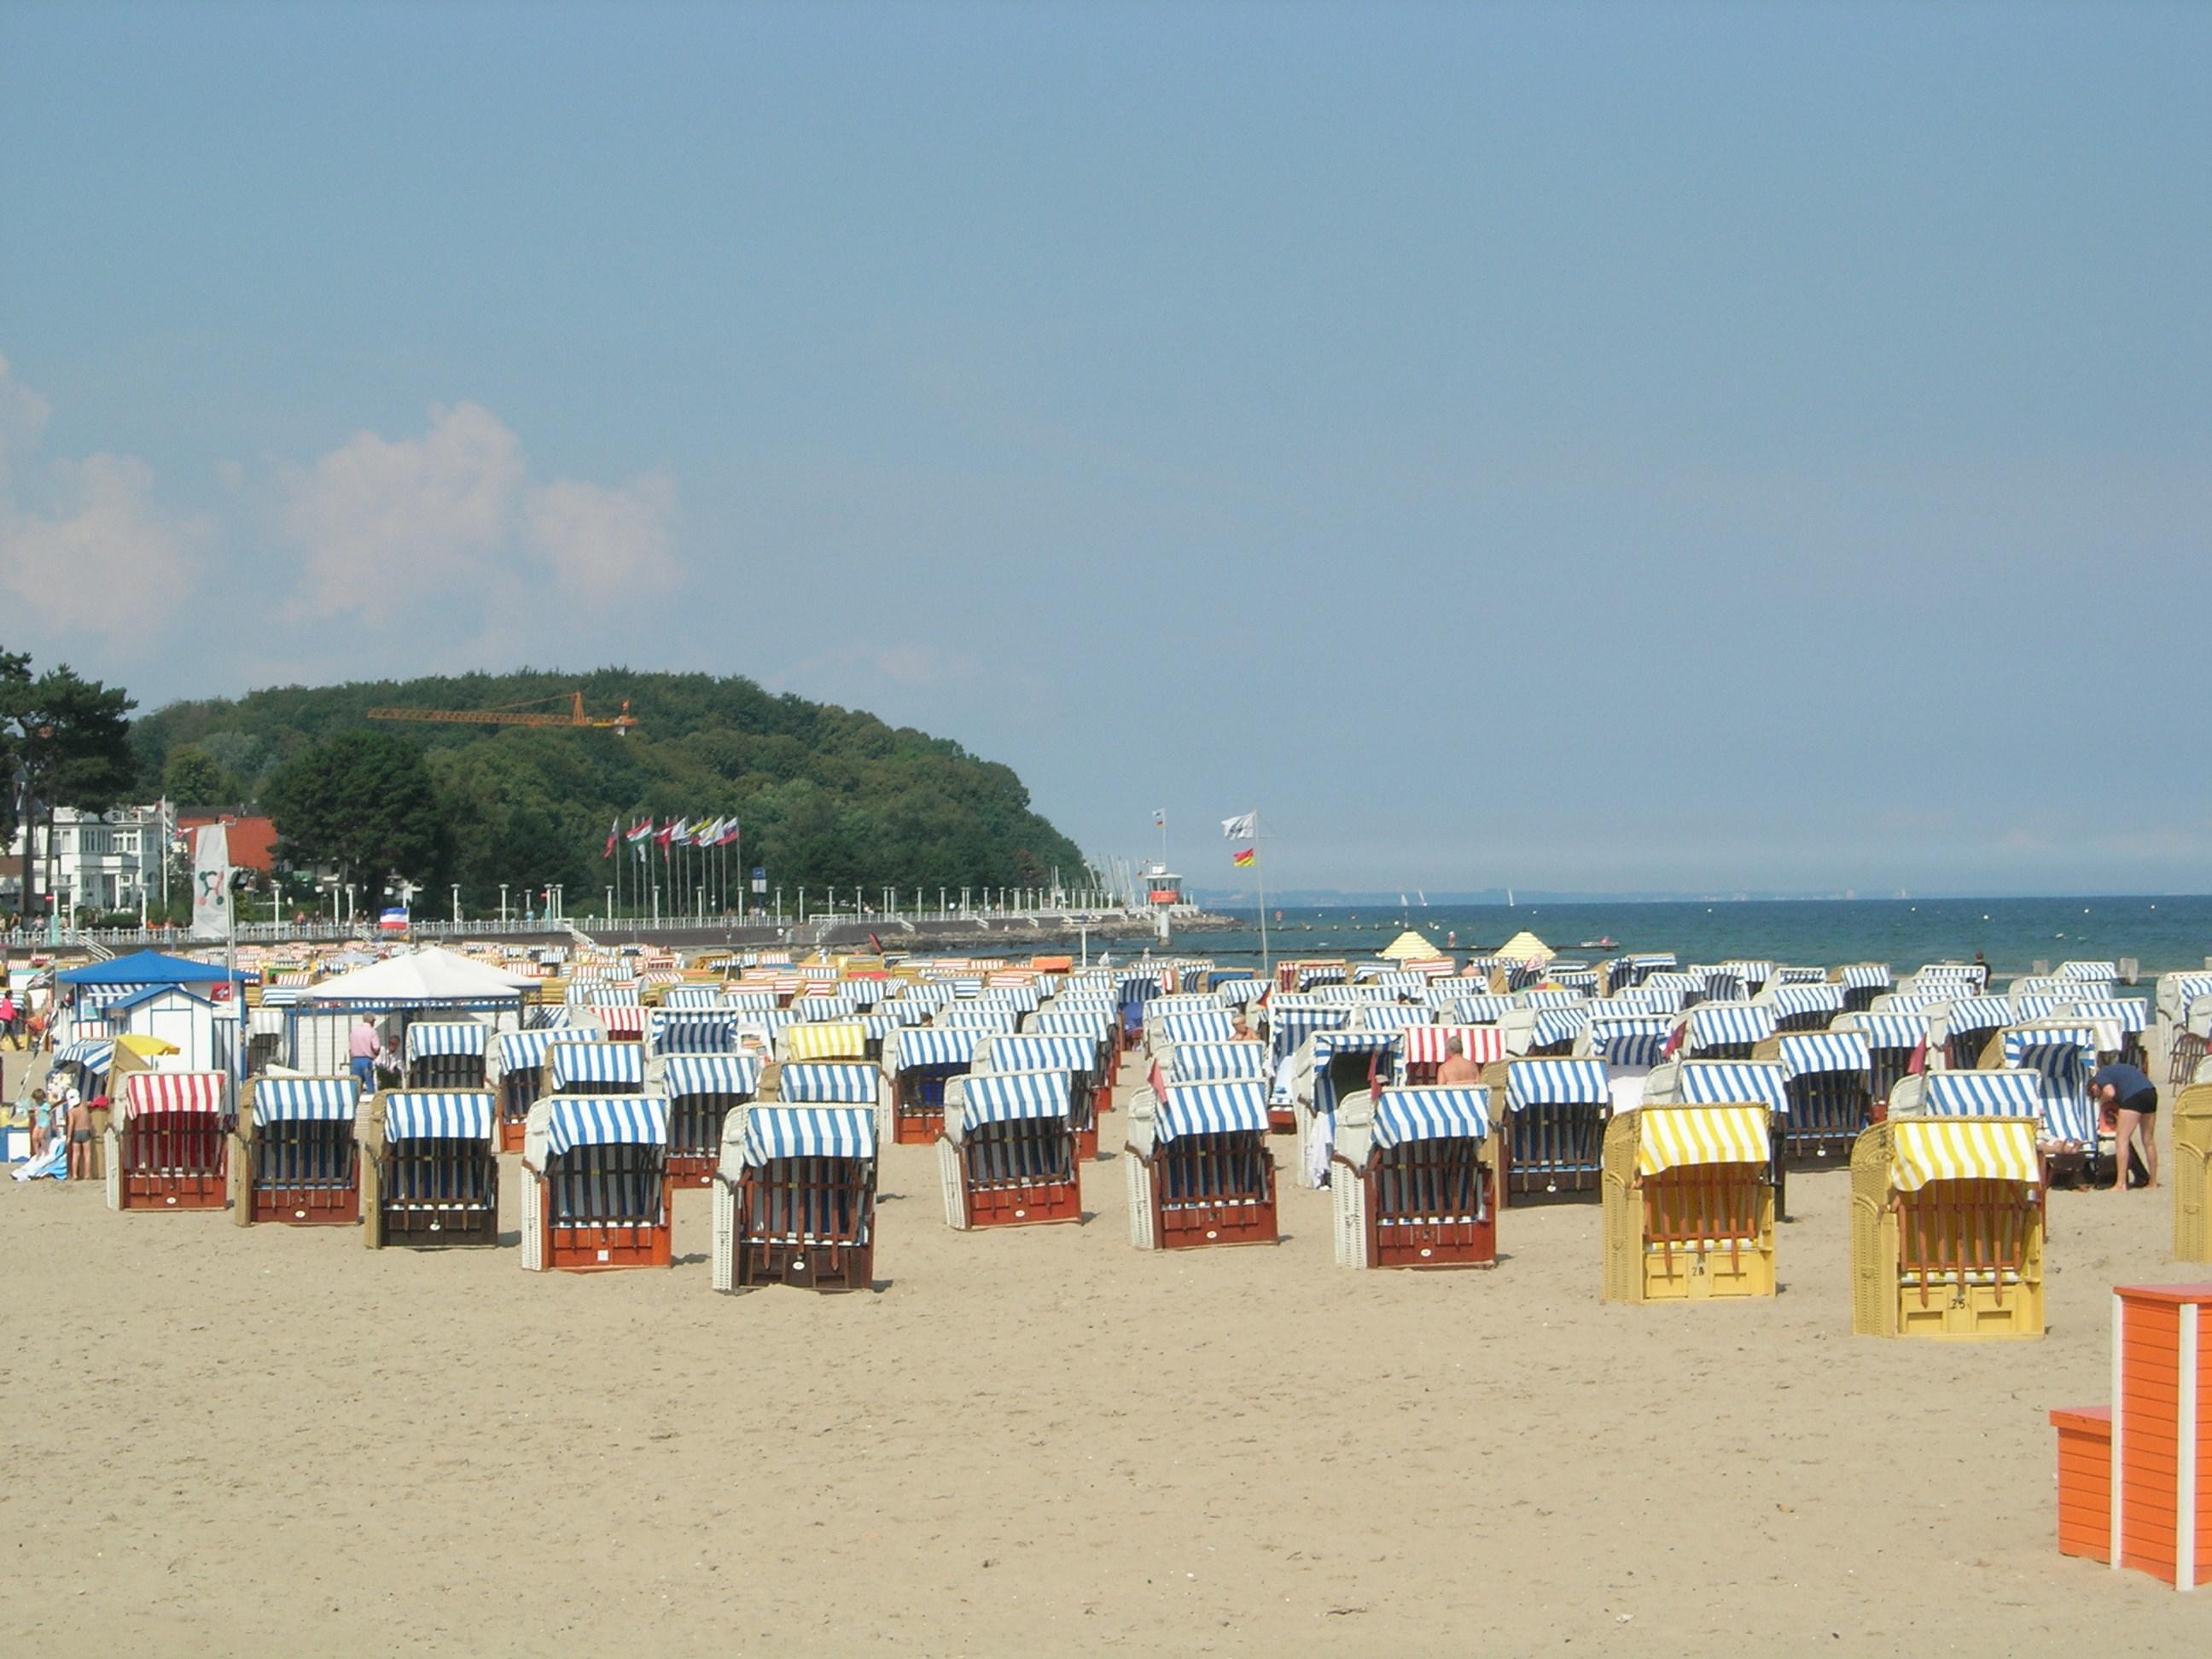 File:Travemunde_beach on Life Cover